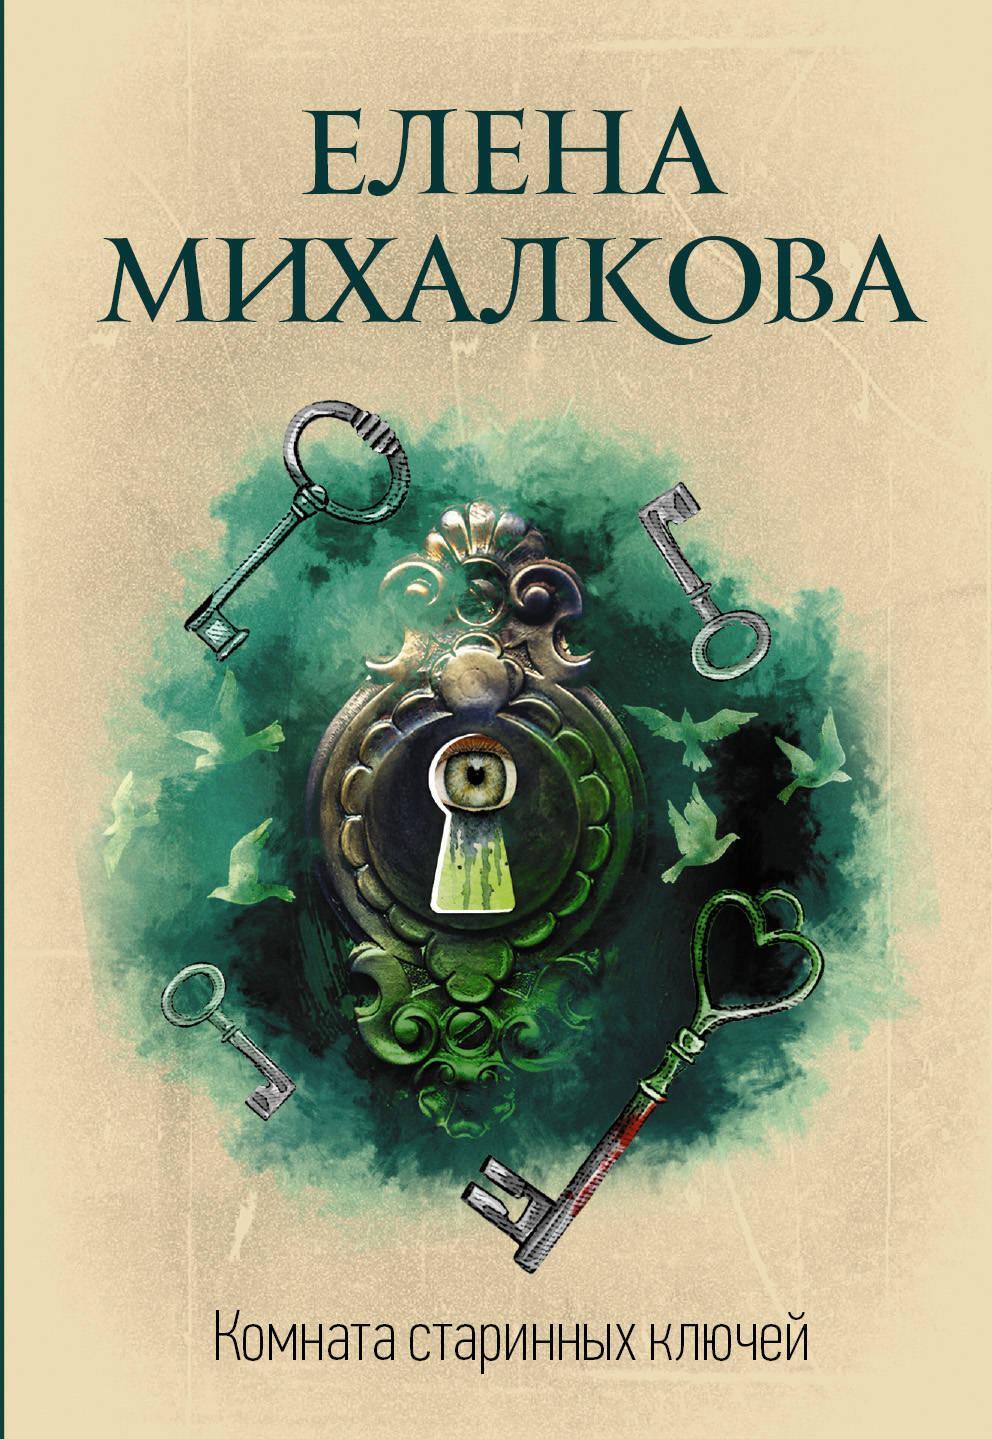 Komnata starinnykh kljuchej | Mikhalkova Elena Ivanovna